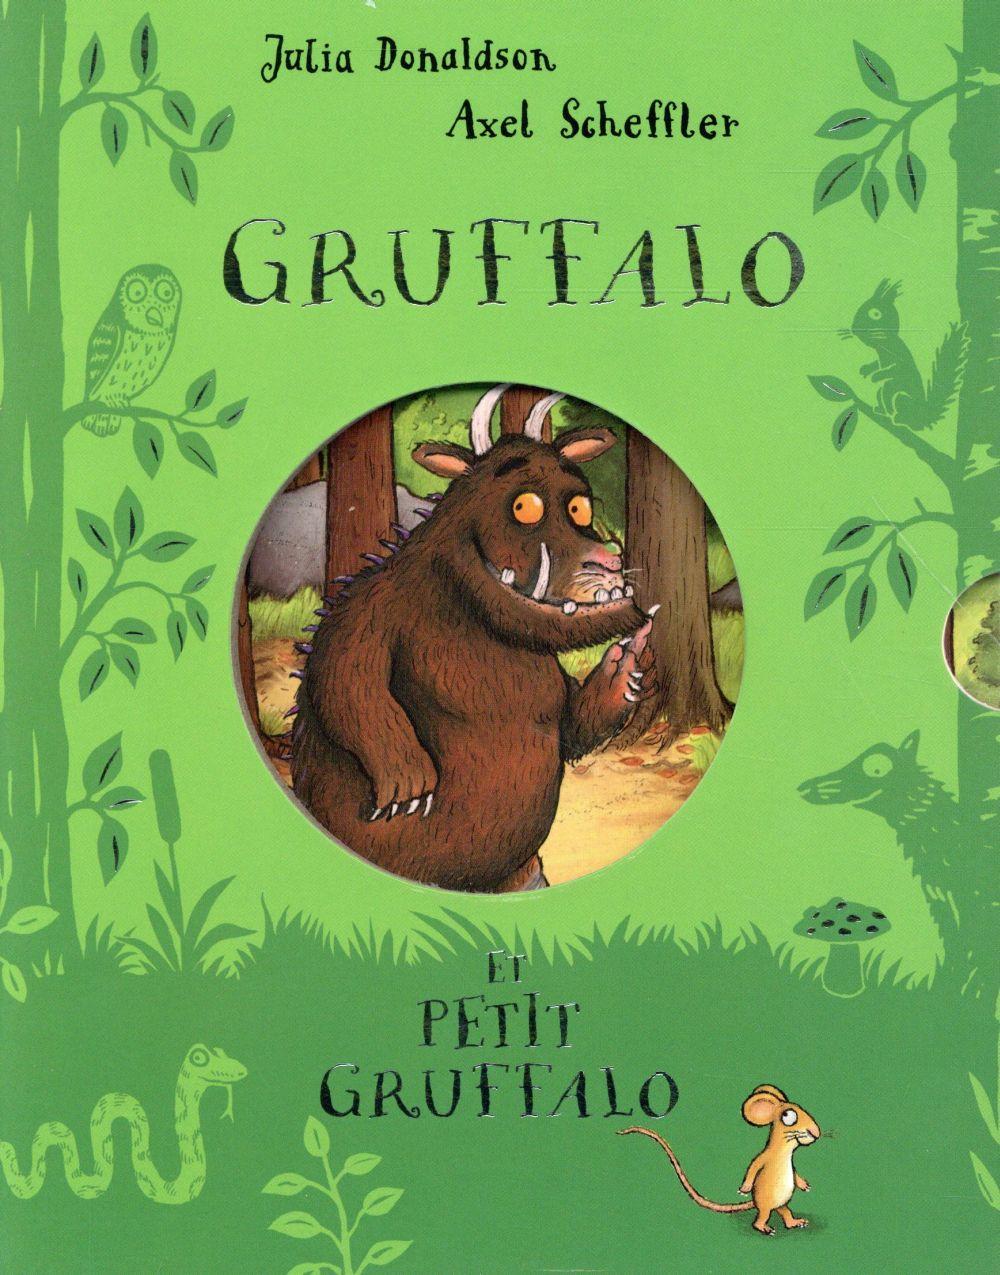 Gruffalo et petit Gruffalo : coffret